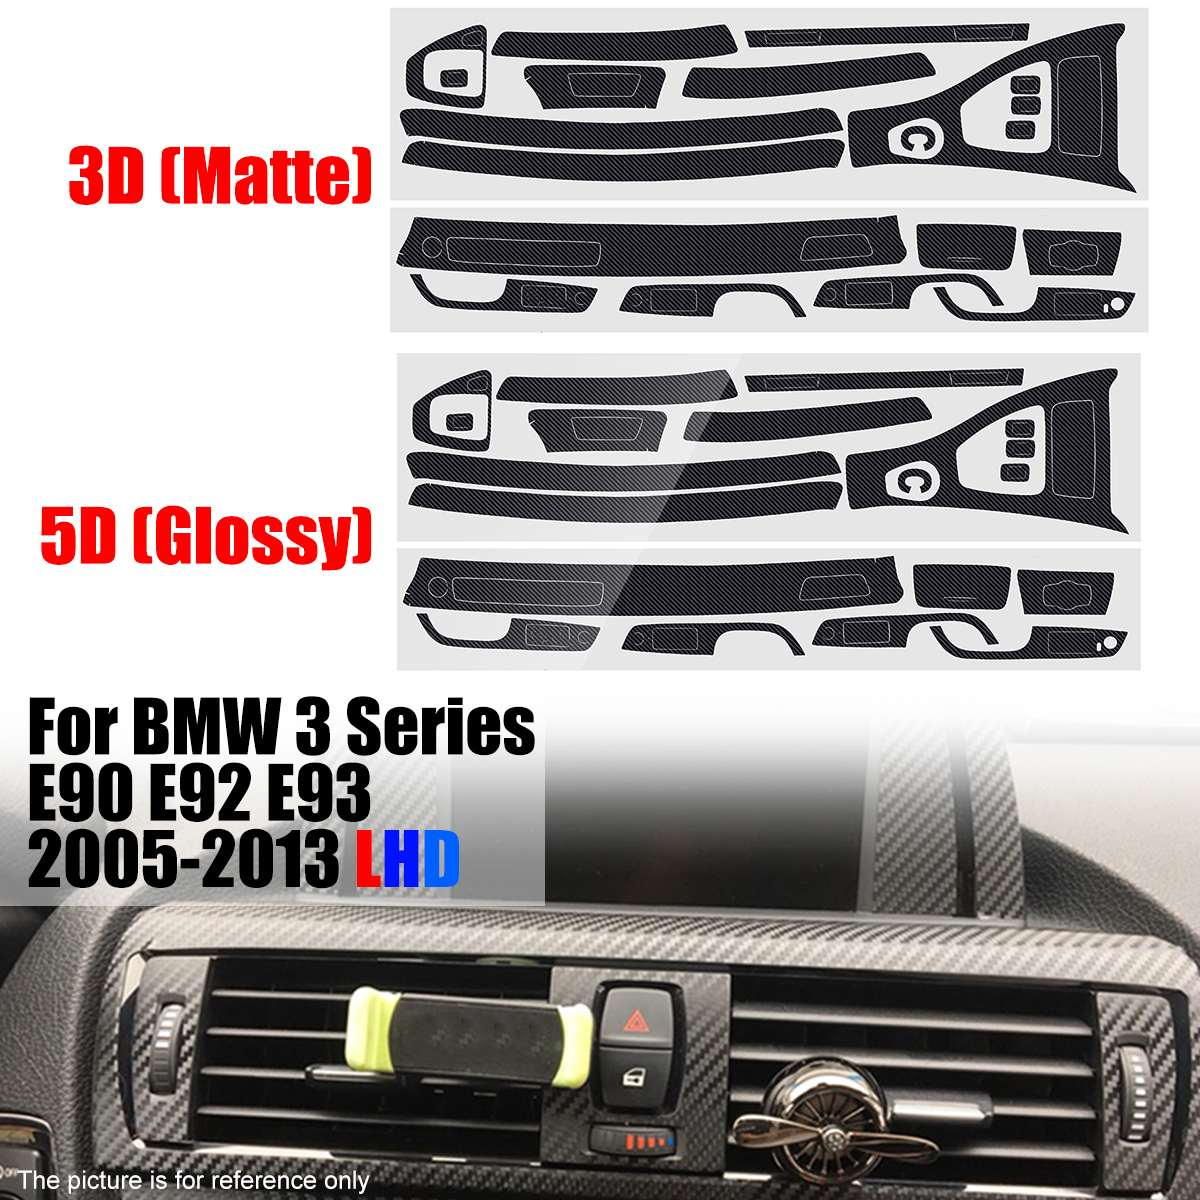 Matte/Glossy Sticker Carbon Fiber Interior Central Control Console Trim For BMW 3 Series E90 E92 E93 2005-2013 LHD Only